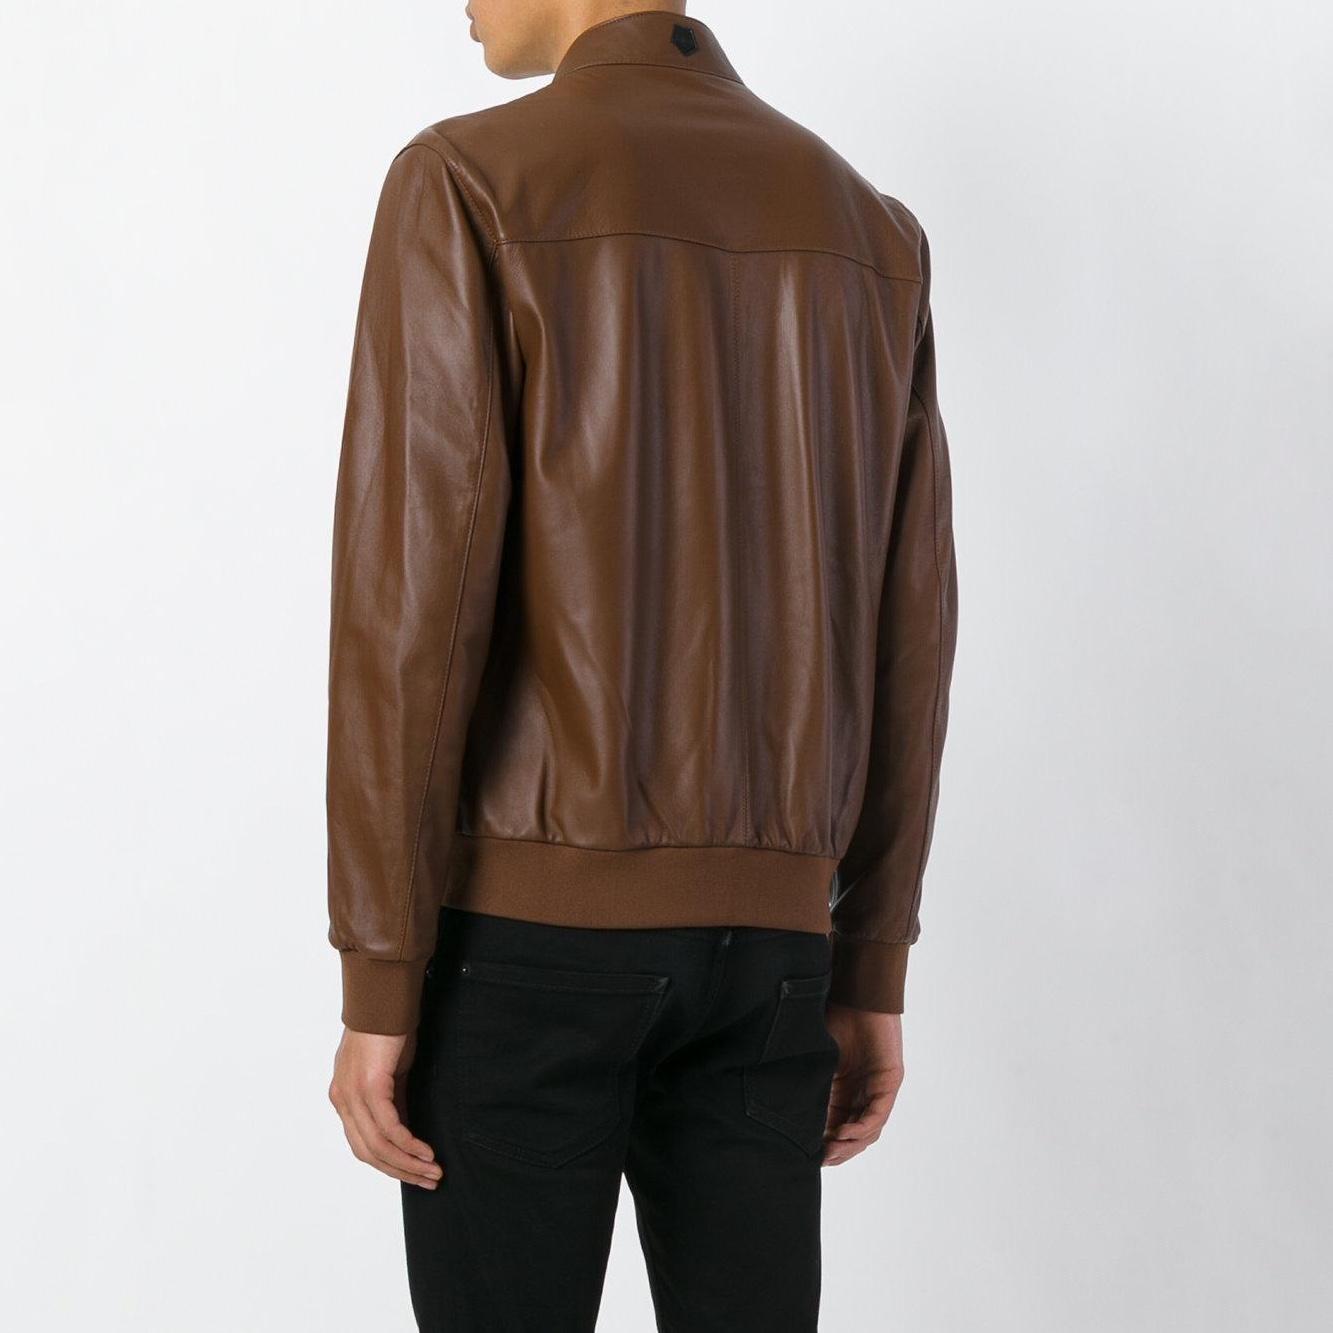 z-zegna-Brown-Bomber-style-Jacket (3).jpg